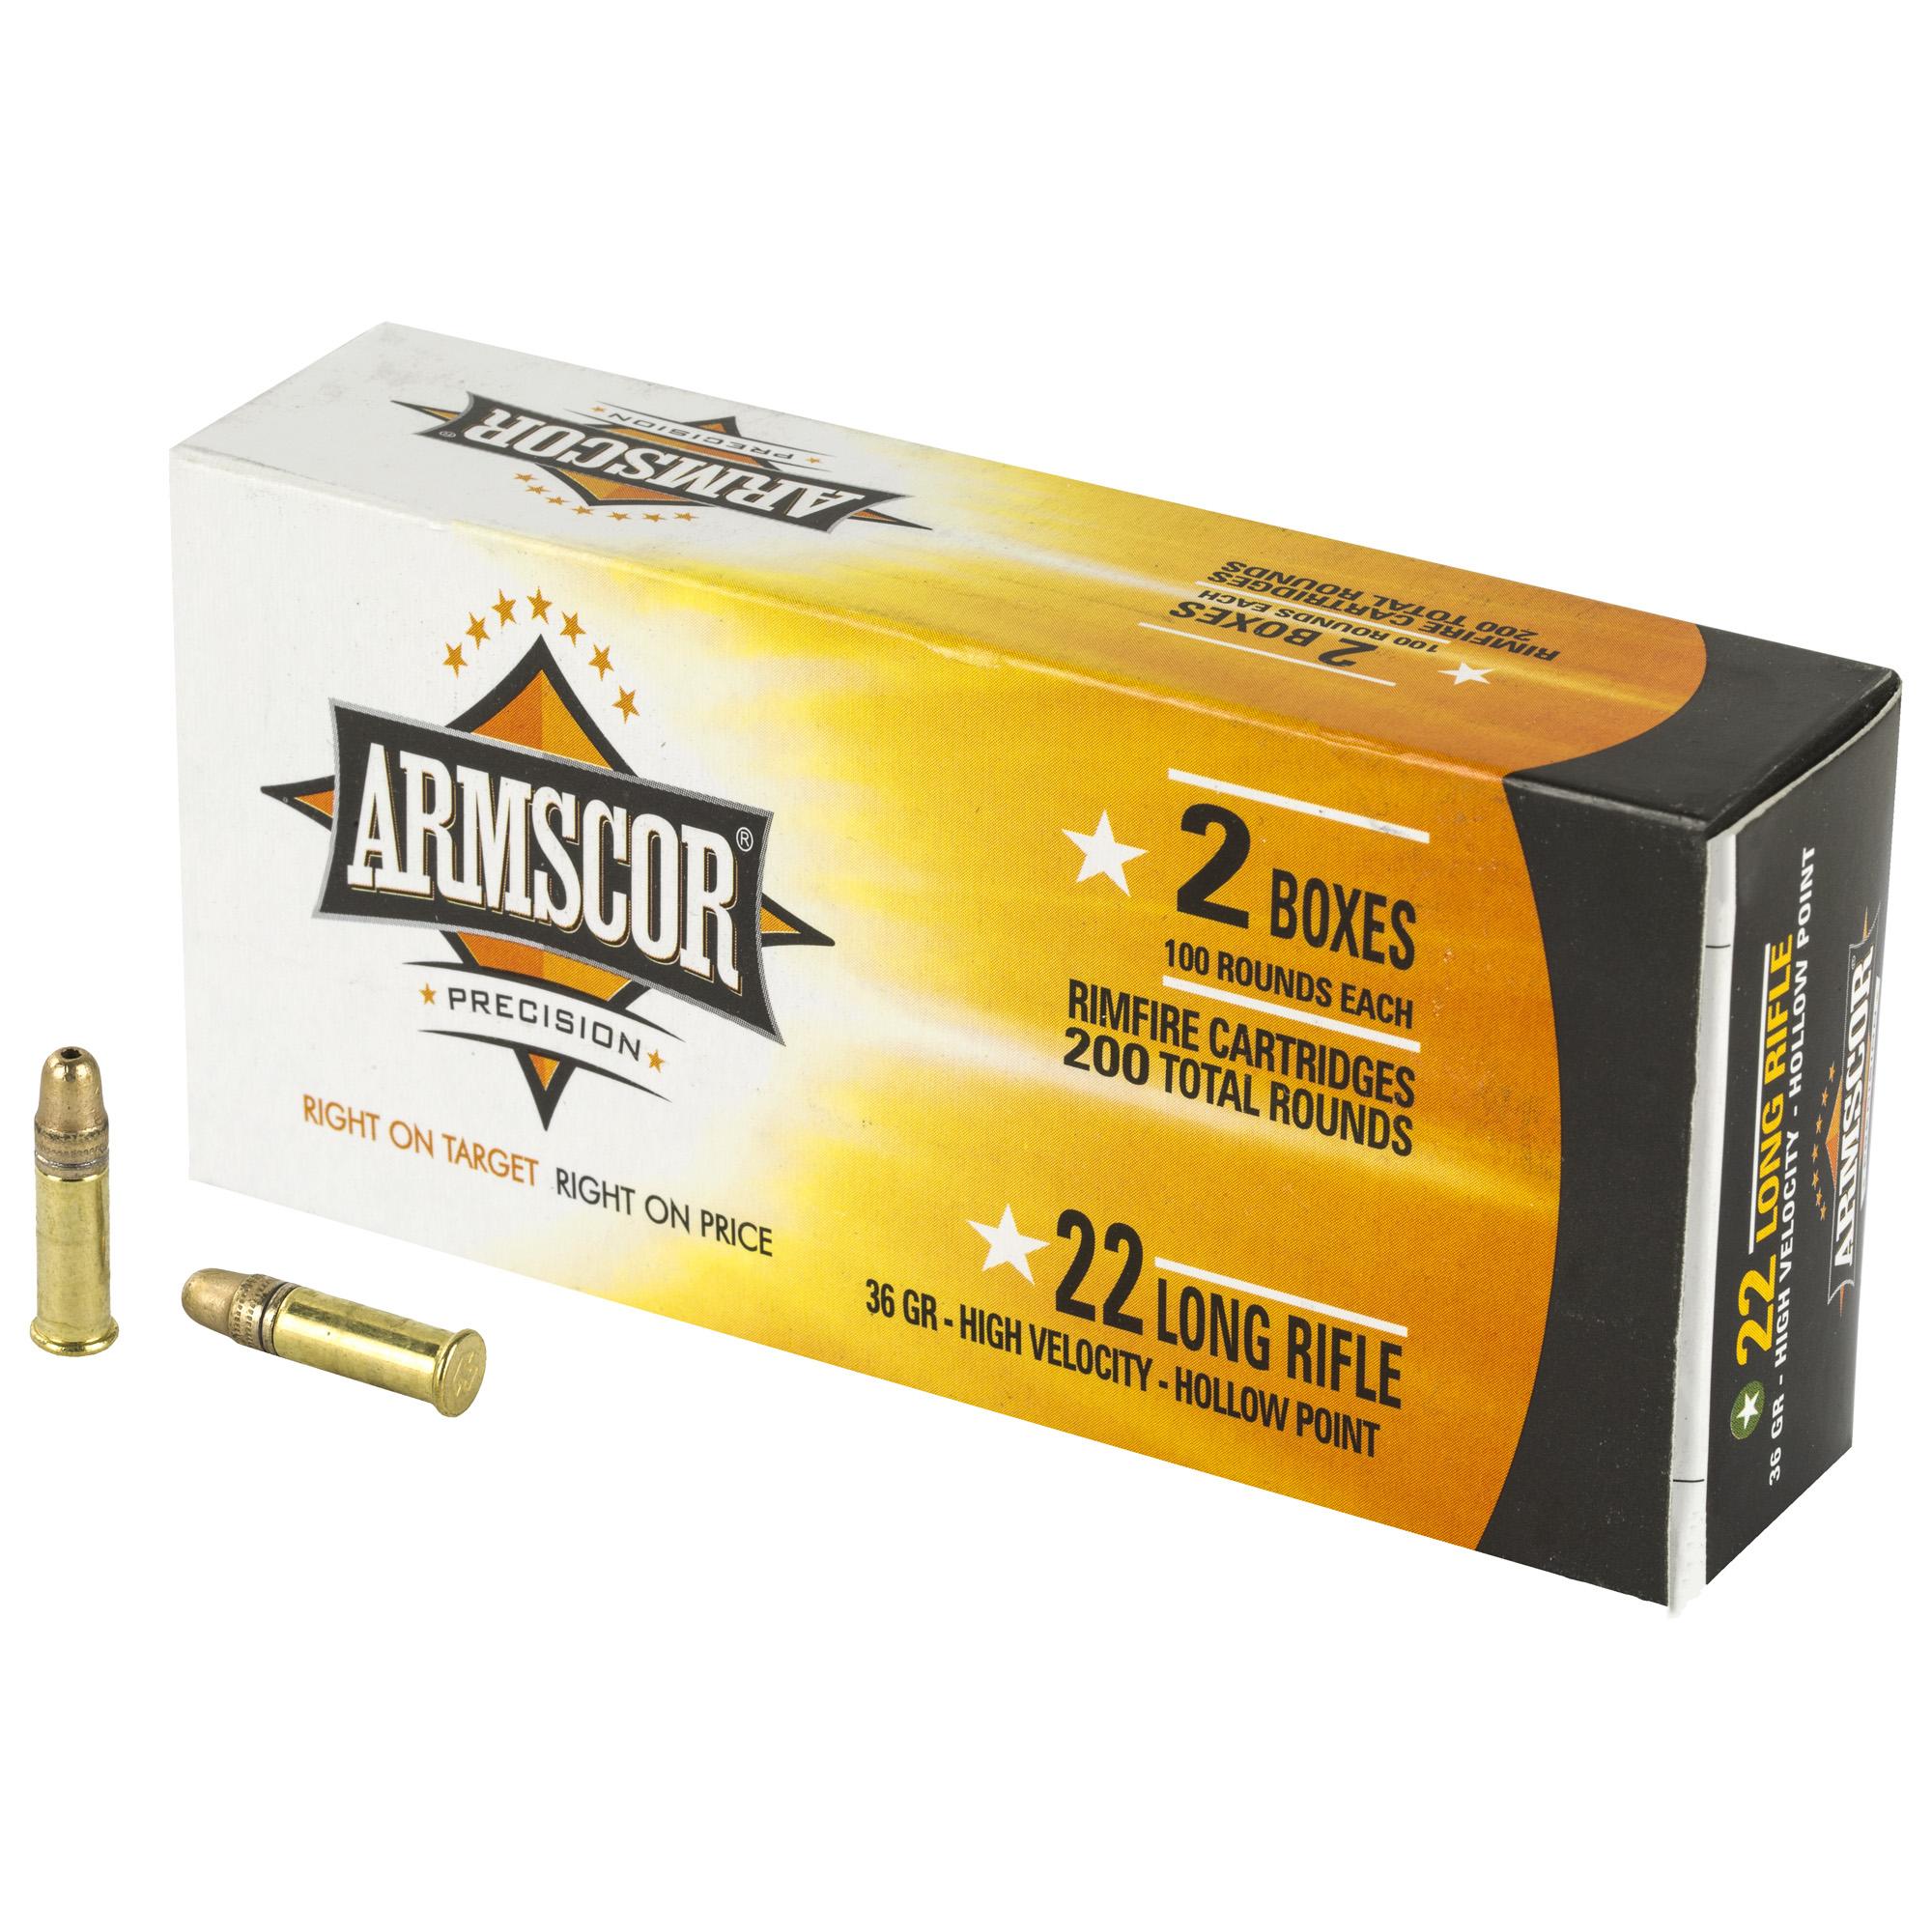 Armscor 22lr Hvhp 36gr 200/2400